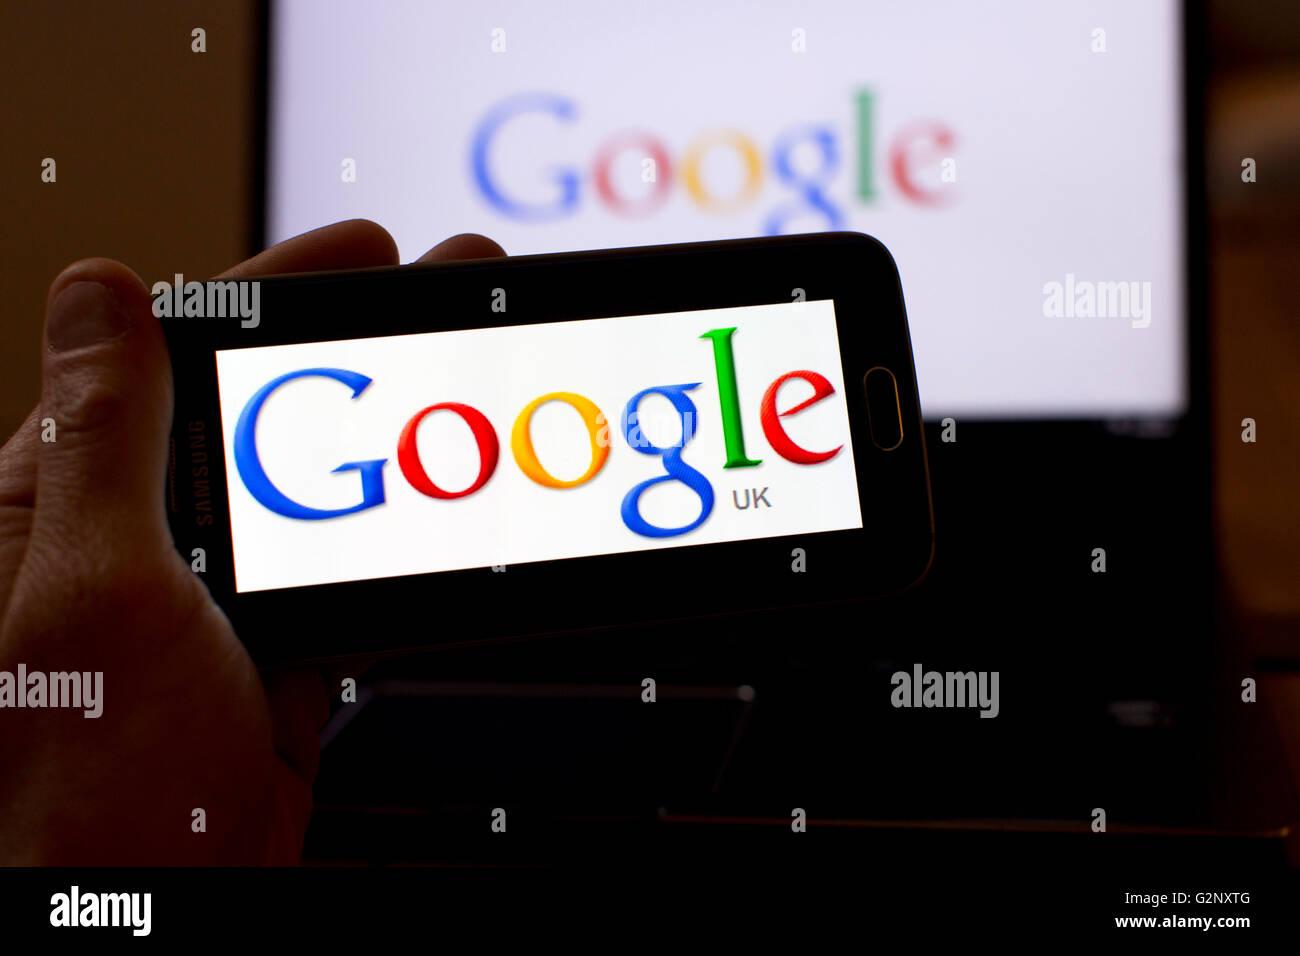 how to buy google stock in uk